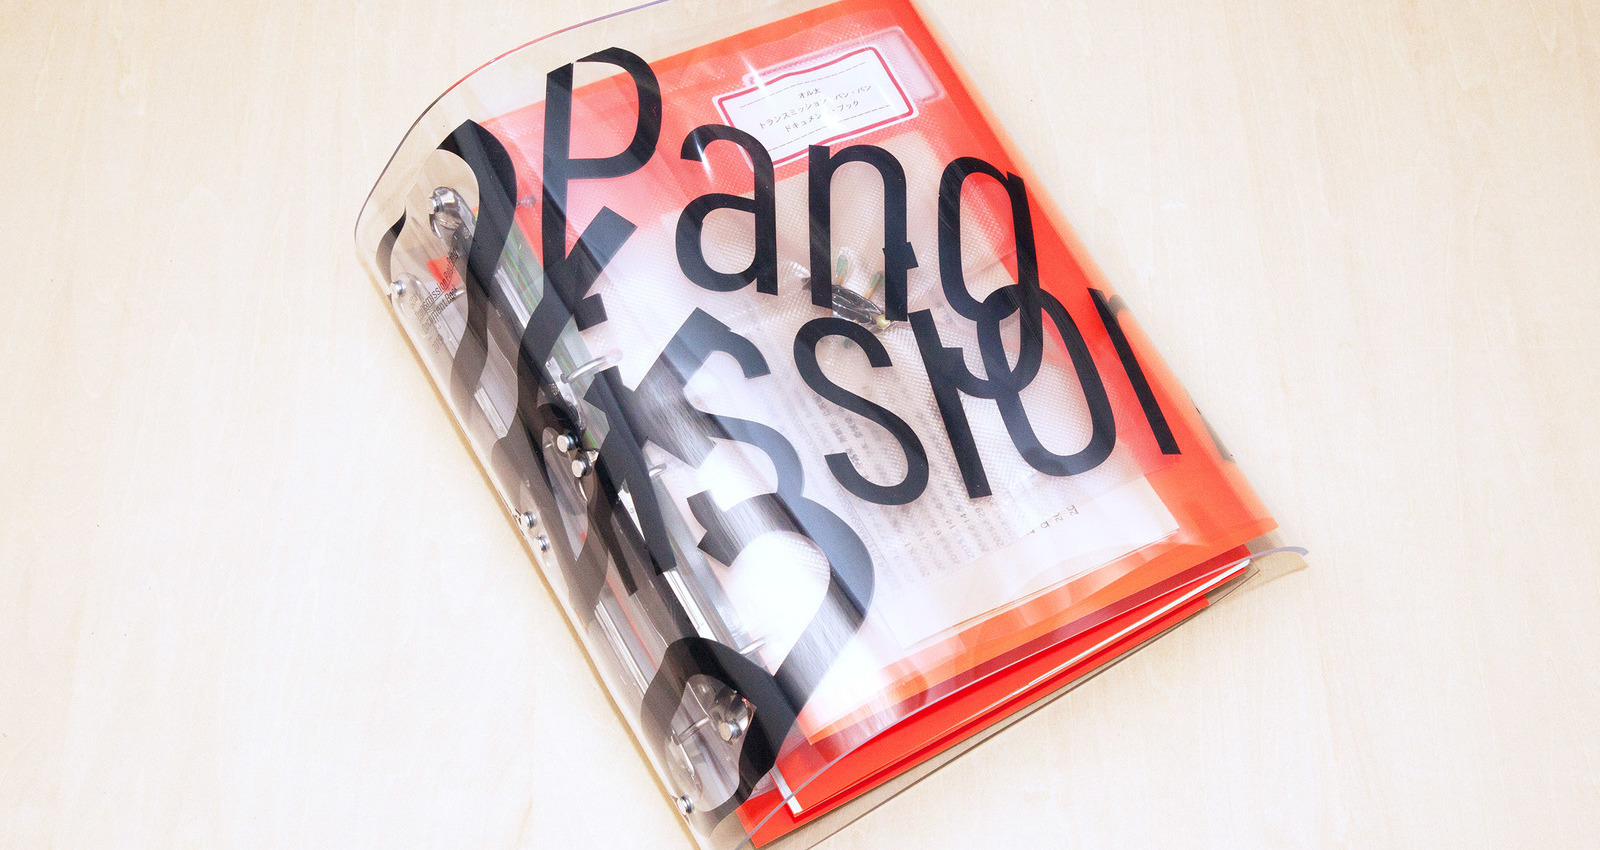 Transmission Pang Pang Document Book